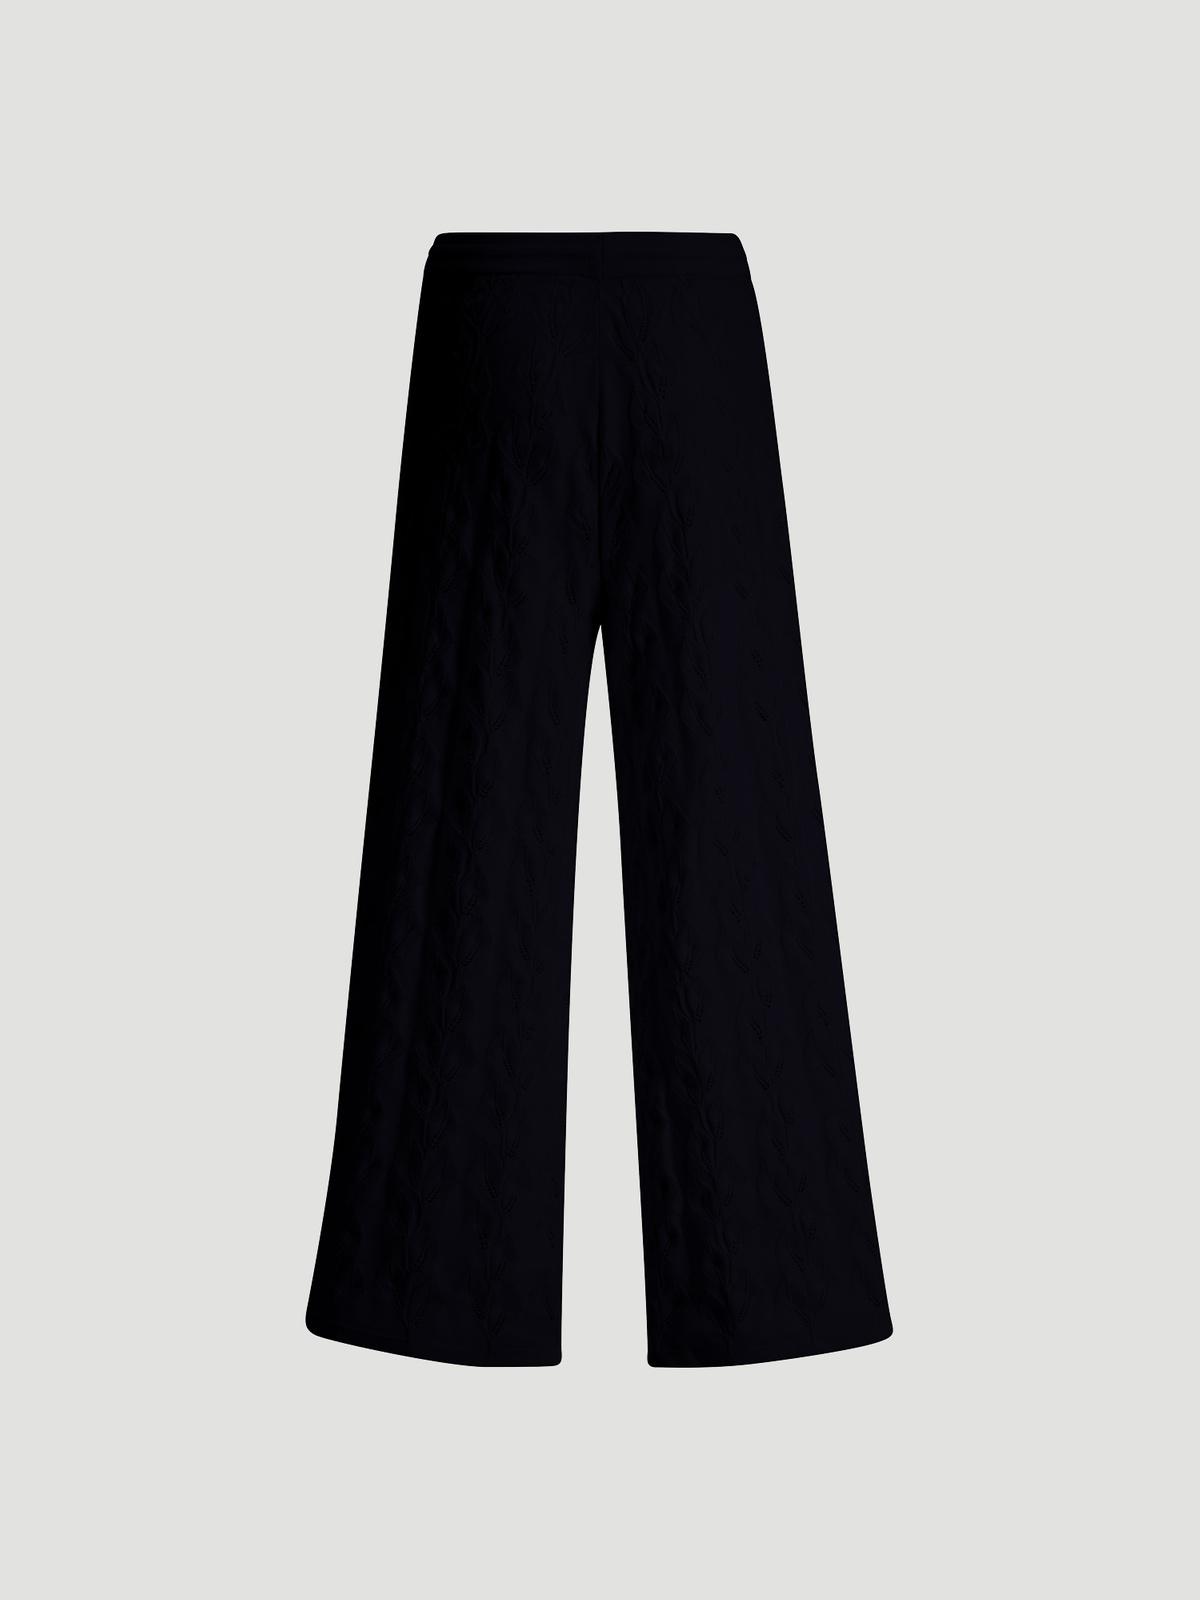 Thiril Knit Trouser Black 6